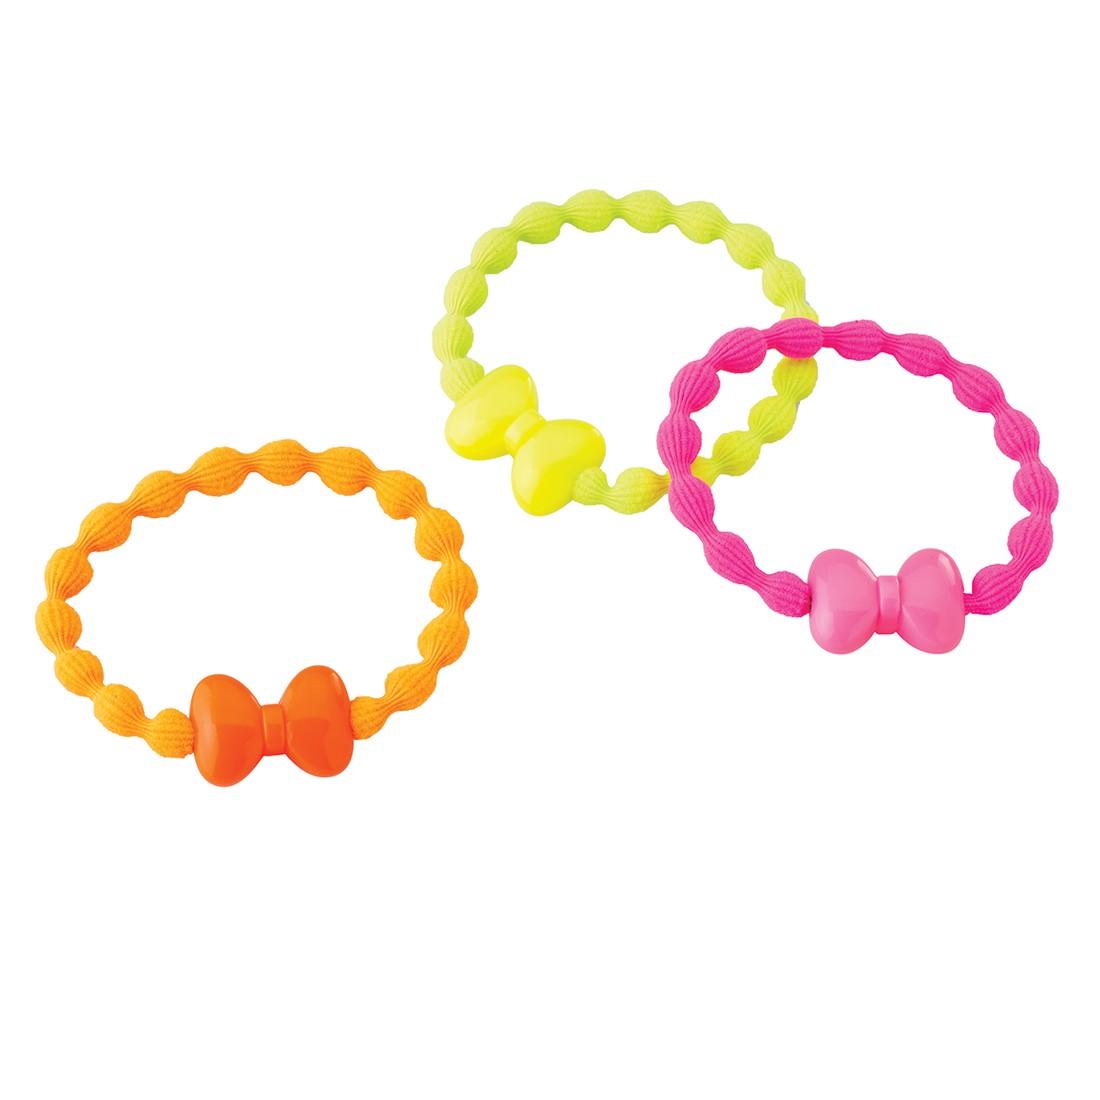 Hair Band Bracelets [image]